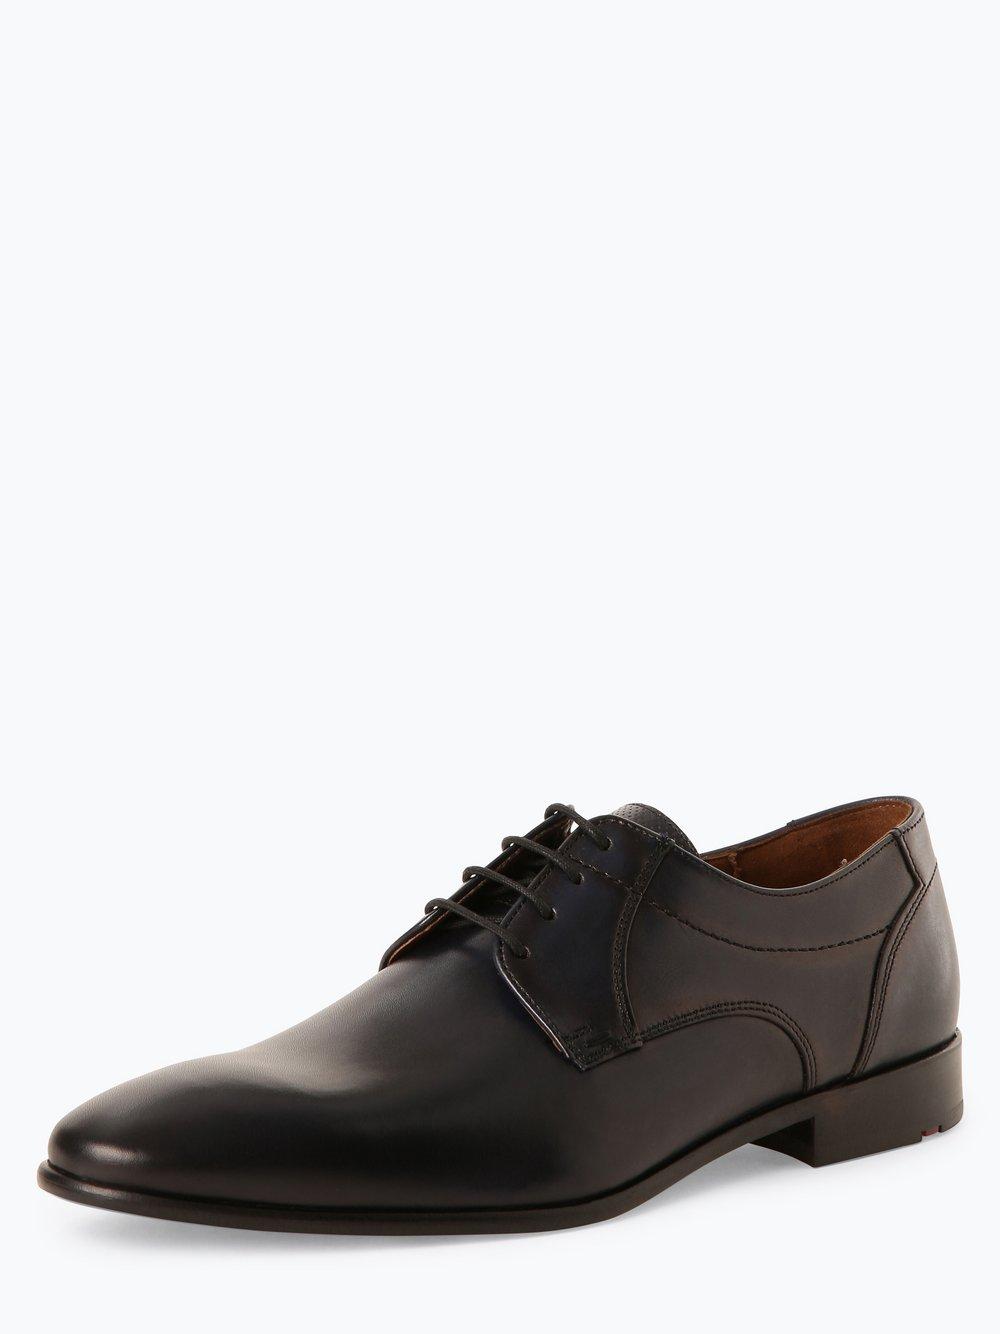 Lloyd – Męskie buty sznurowane ze skóry – Manon, niebieski Van Graaf 449111-0002-00075